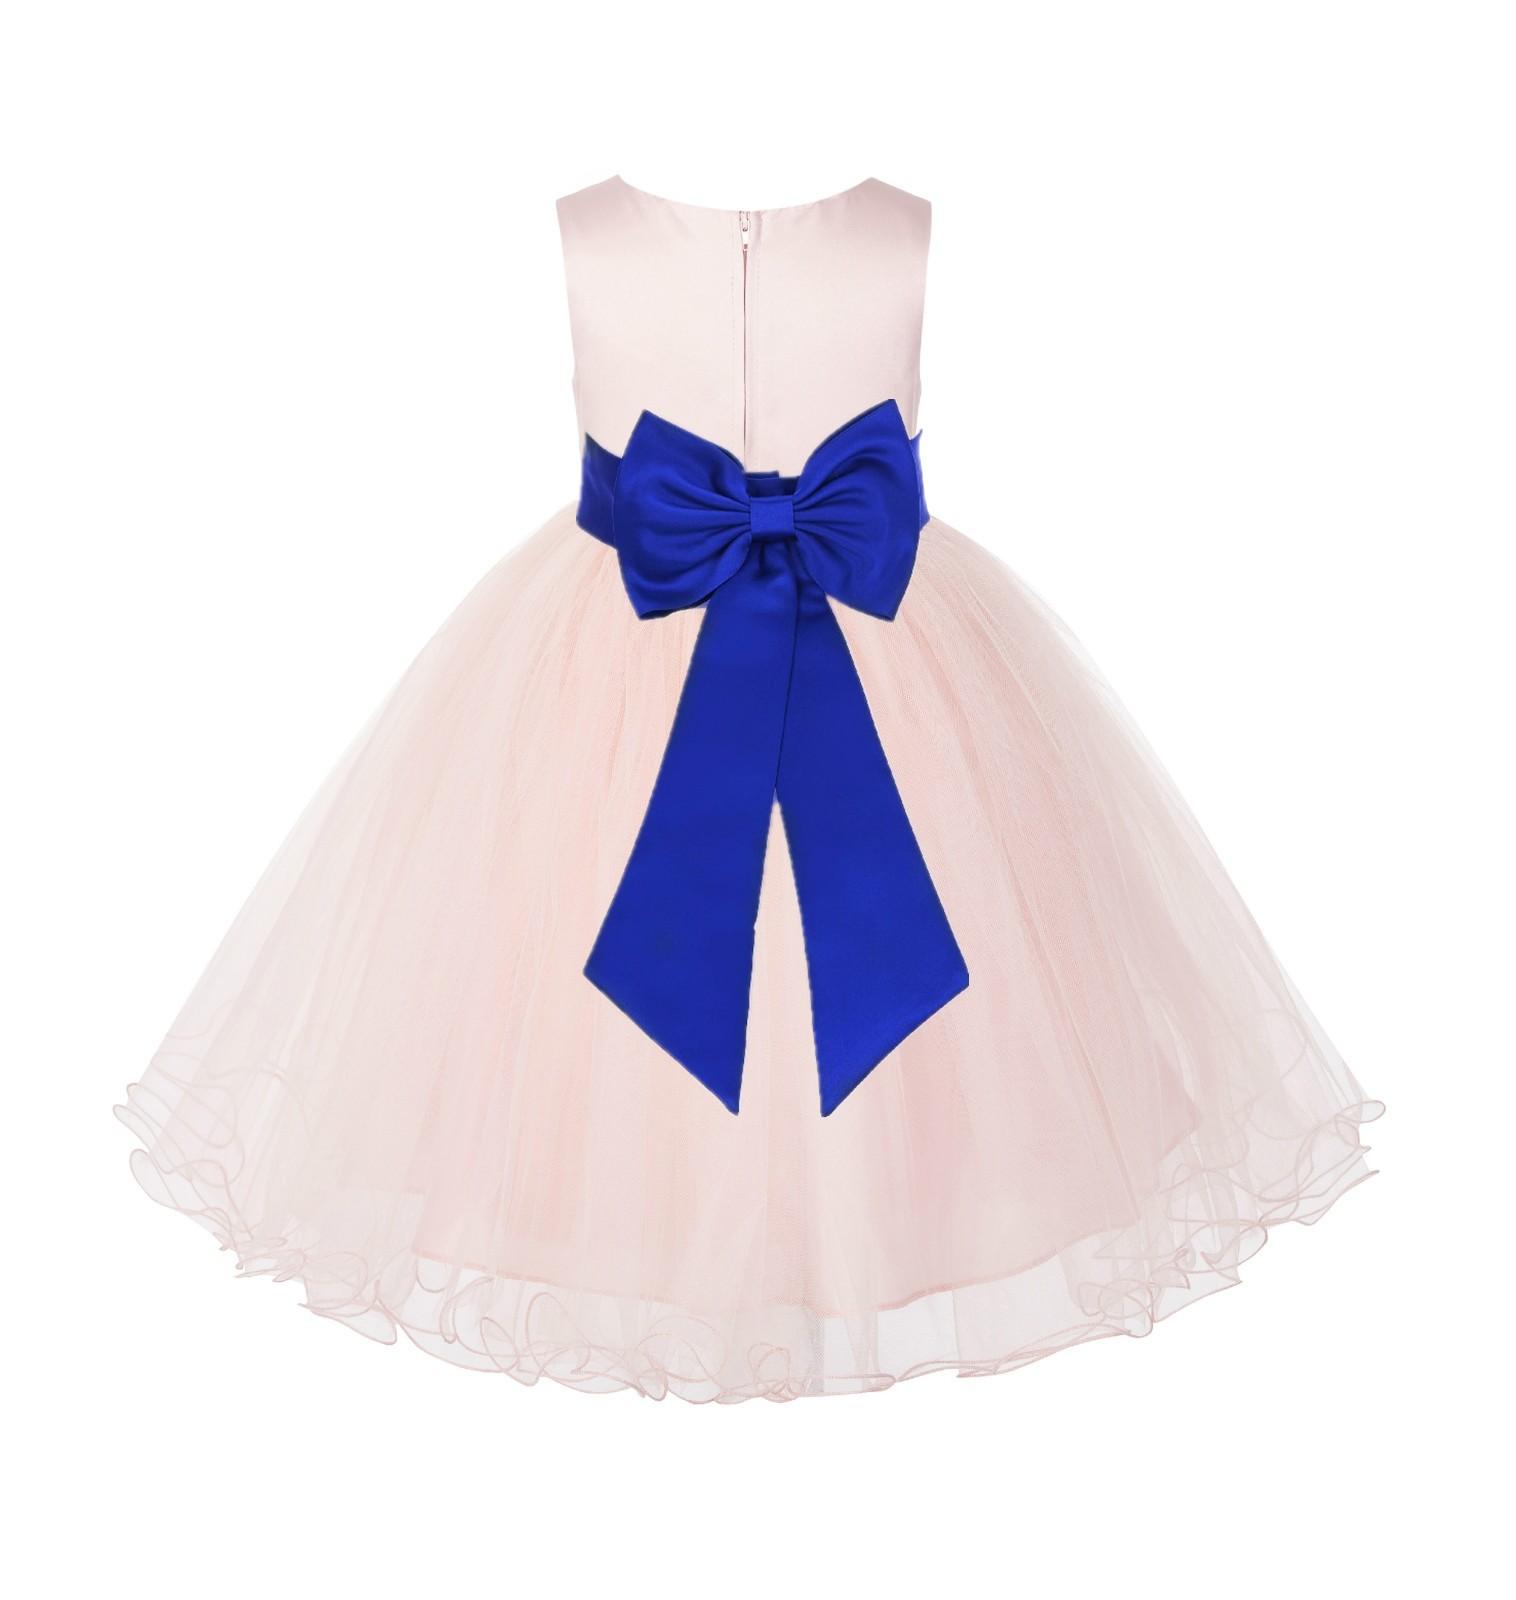 Blush PInk / Horizon Tulle Rattail Edge Flower Girl Dress Wedding Bridesmaid 829T